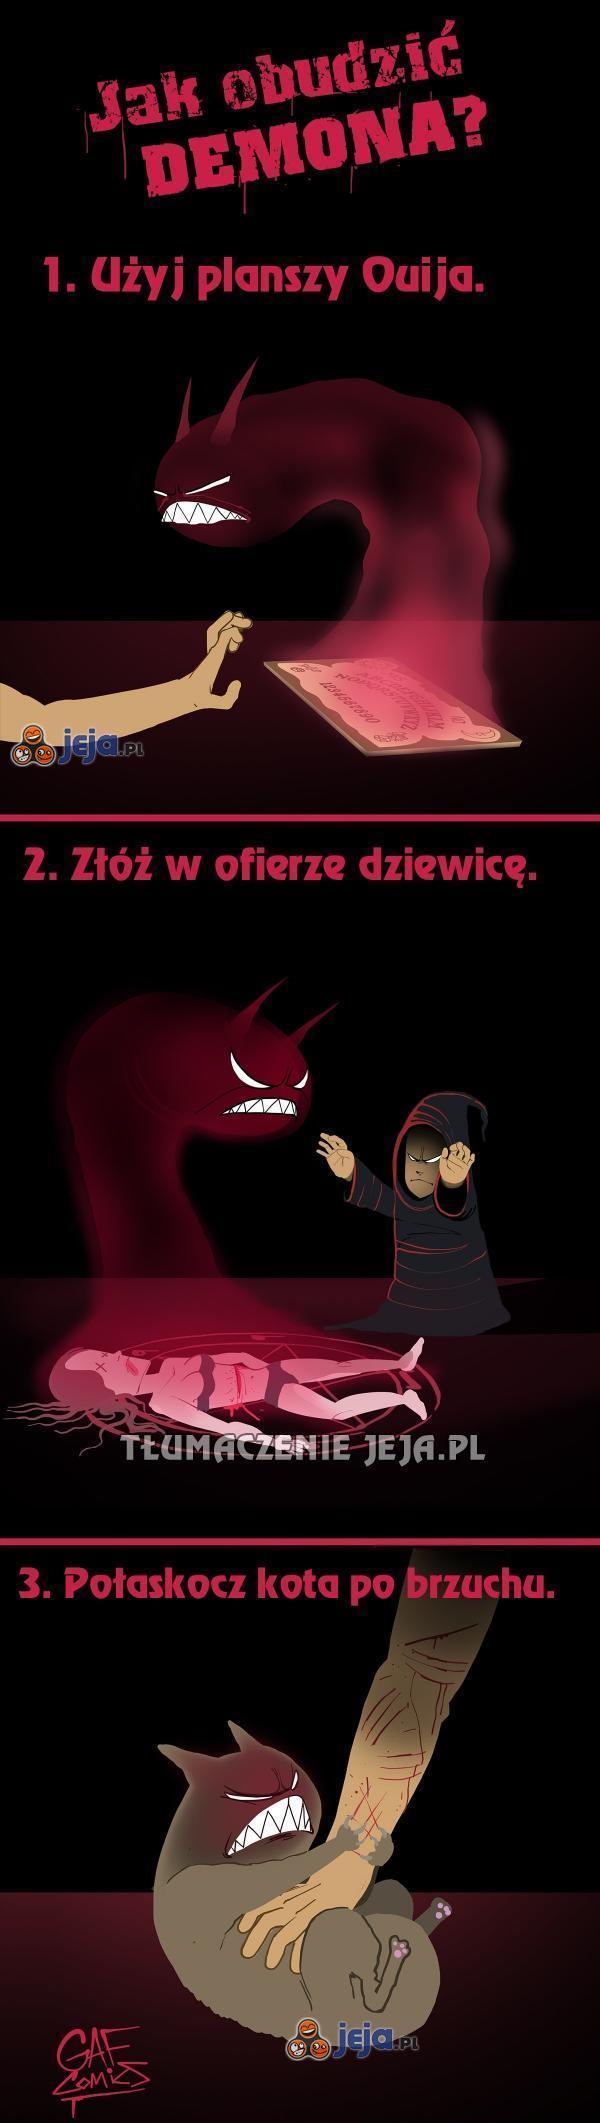 Jak obudzić demona?